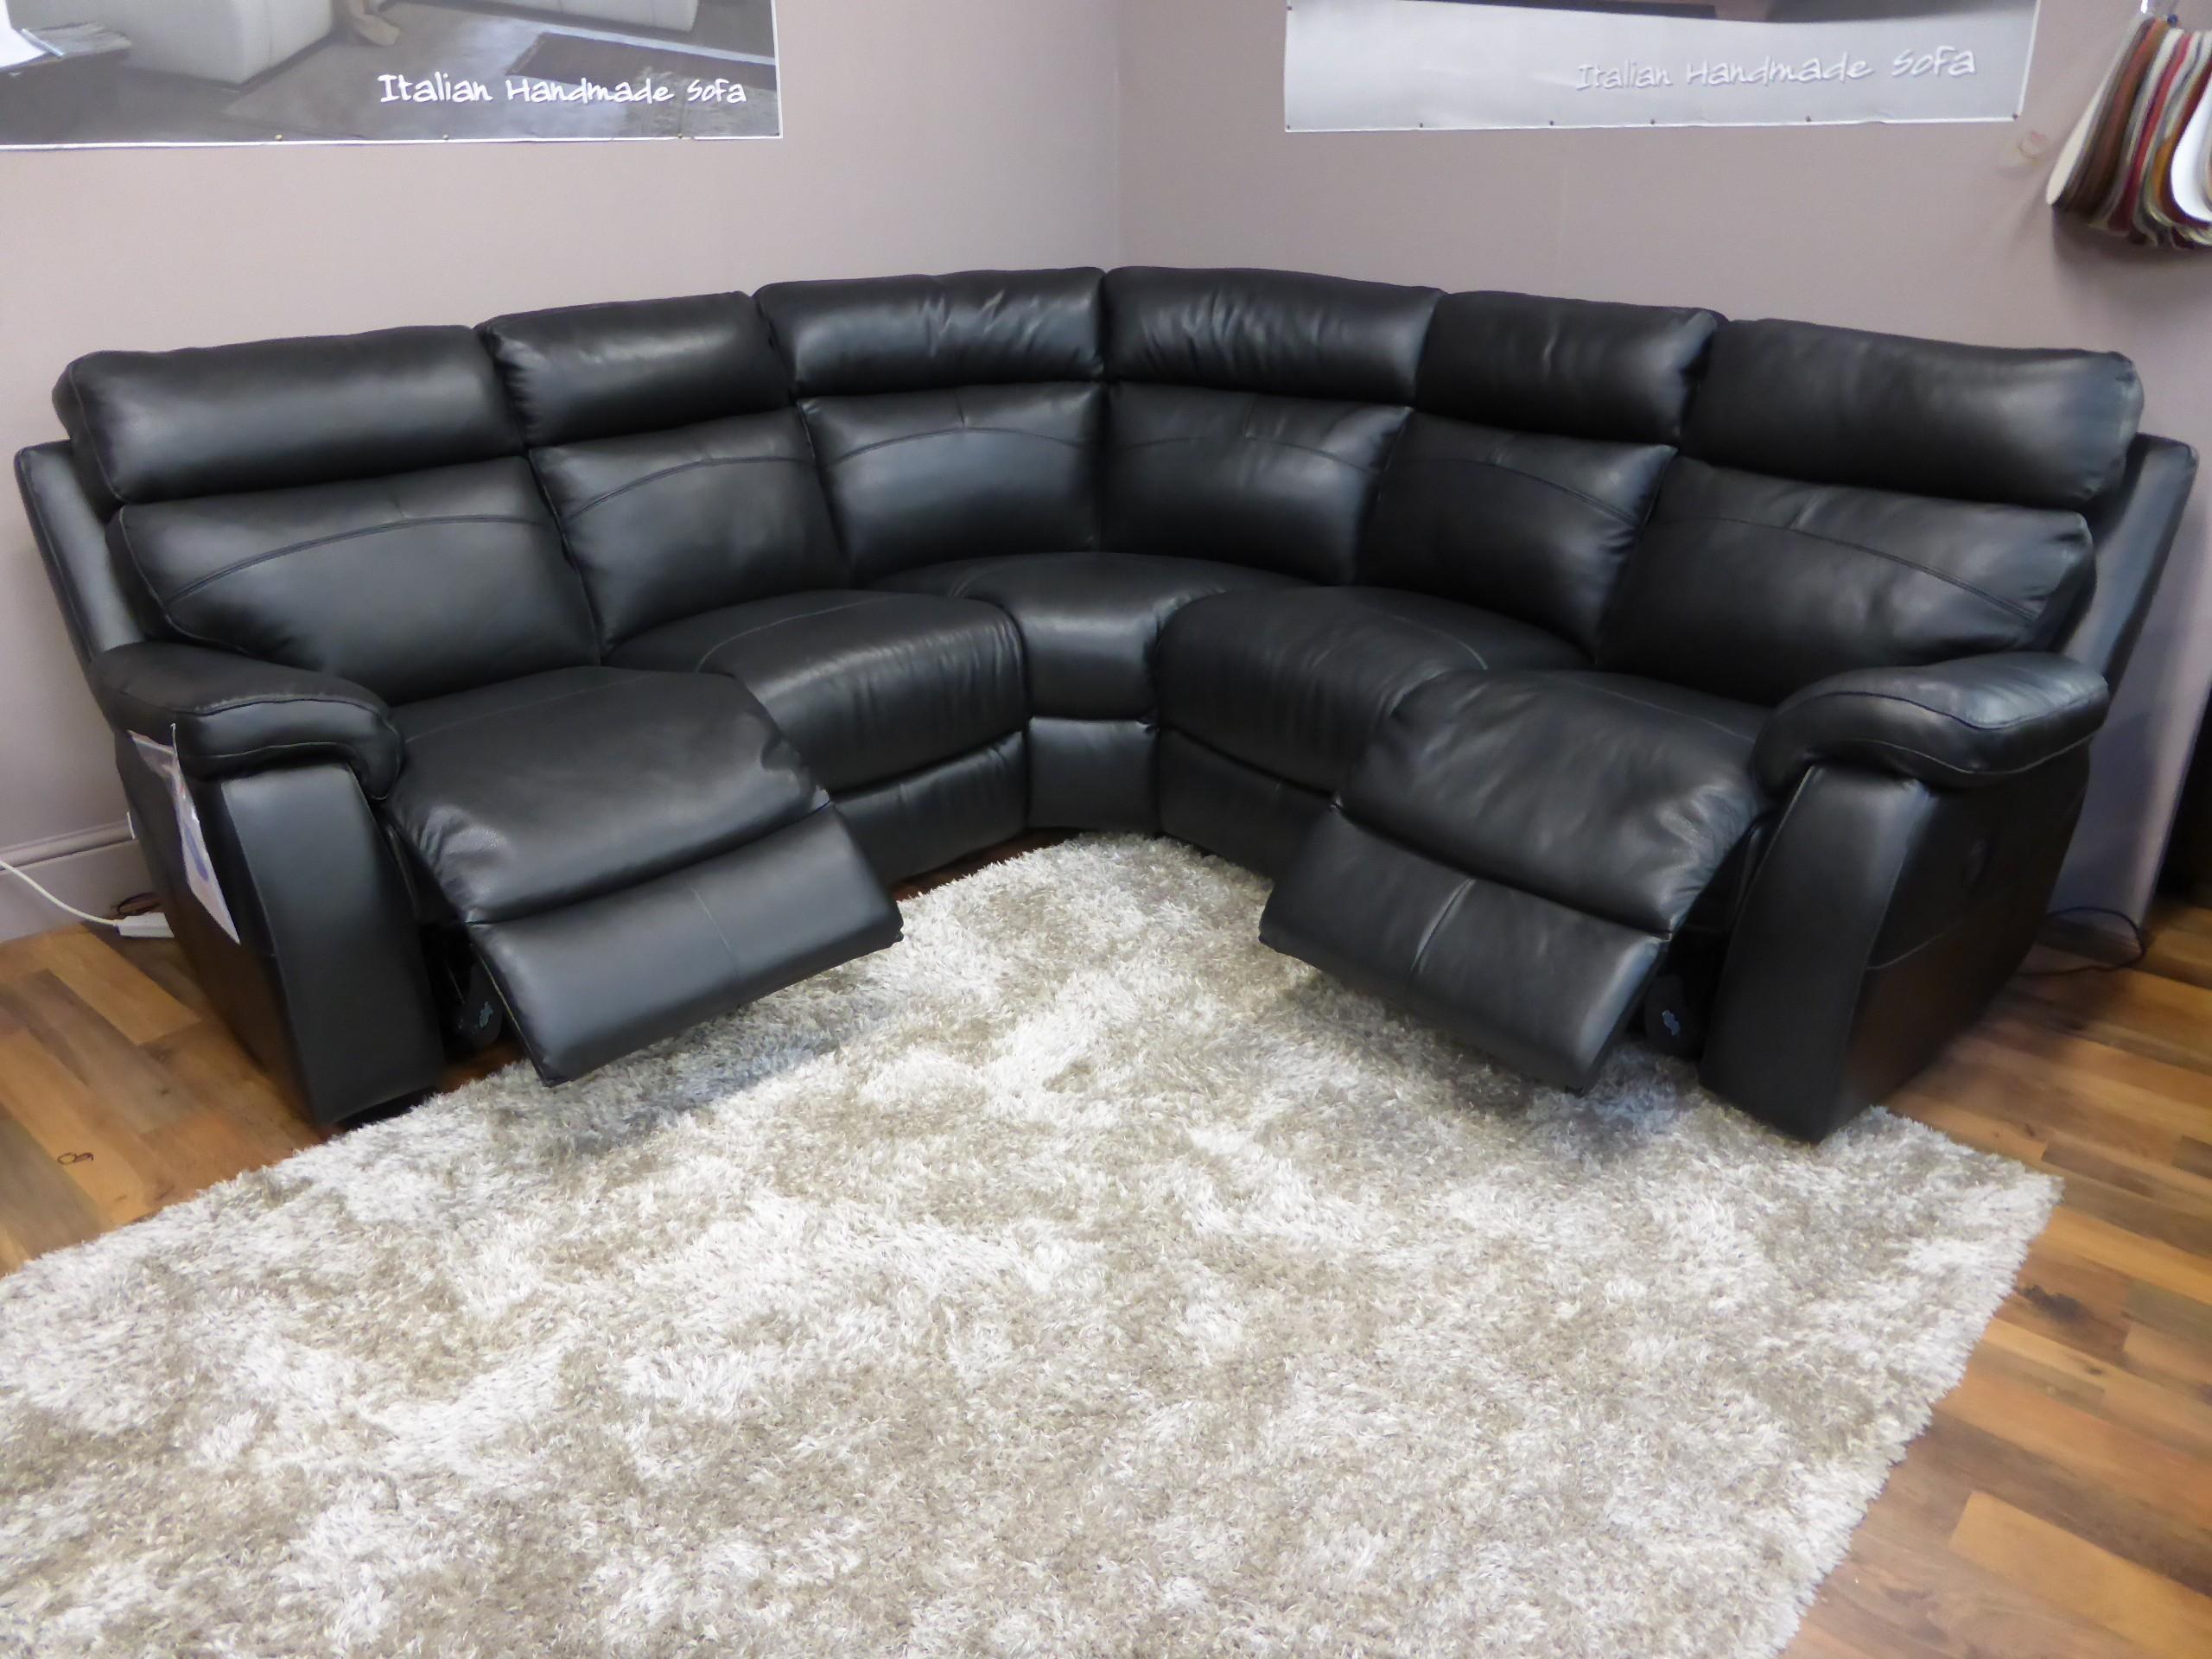 Corner Sofas With Recliners | Tehranmix Decoration Pertaining To Black Leather Corner Sofas (Image 6 of 20)